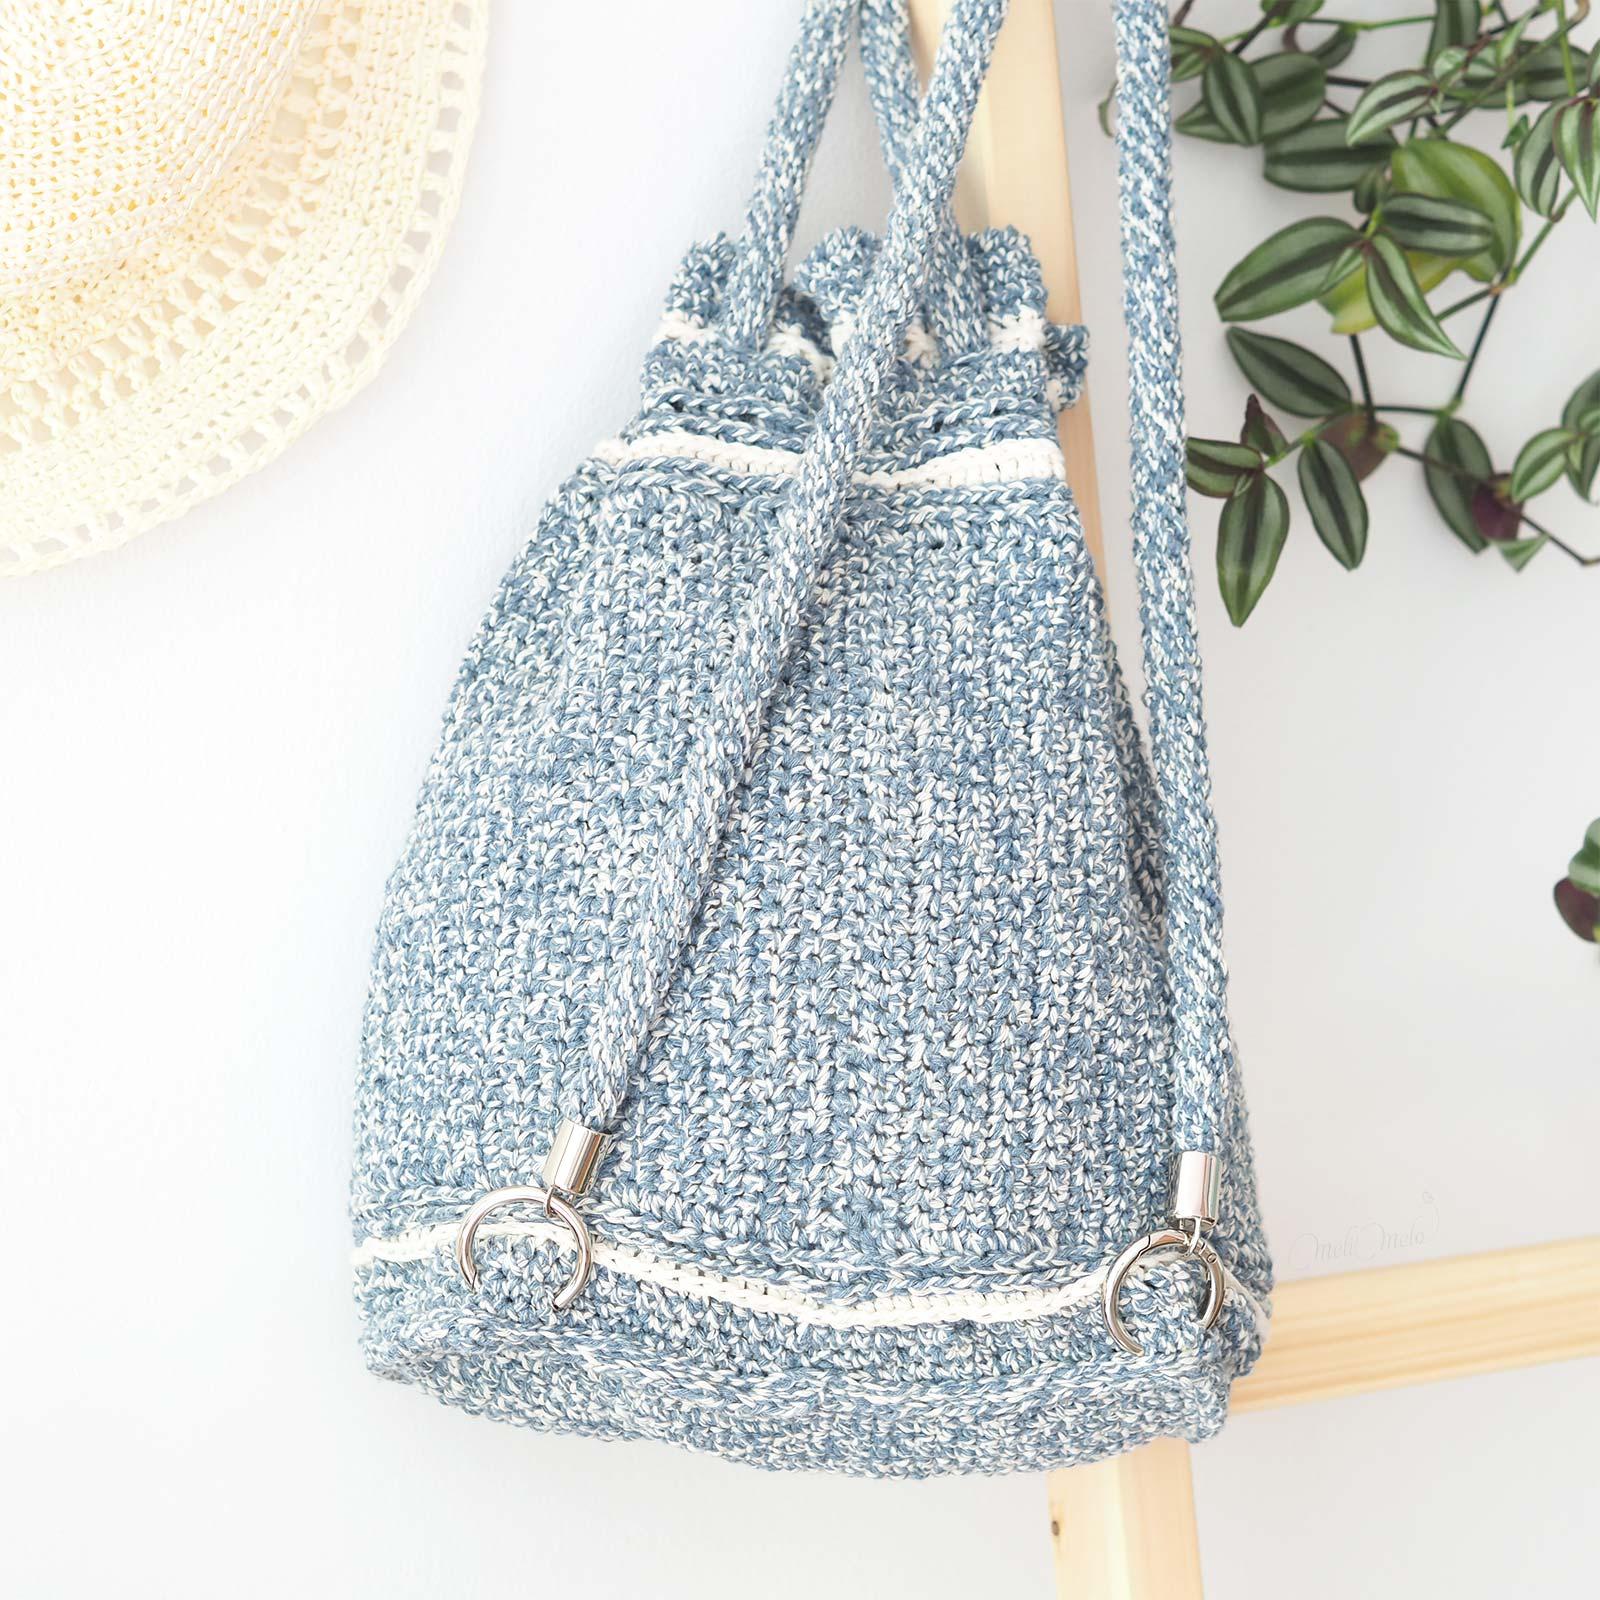 arrière back sac à dos crochet wildrose backpack All About Ami boutique melimelo